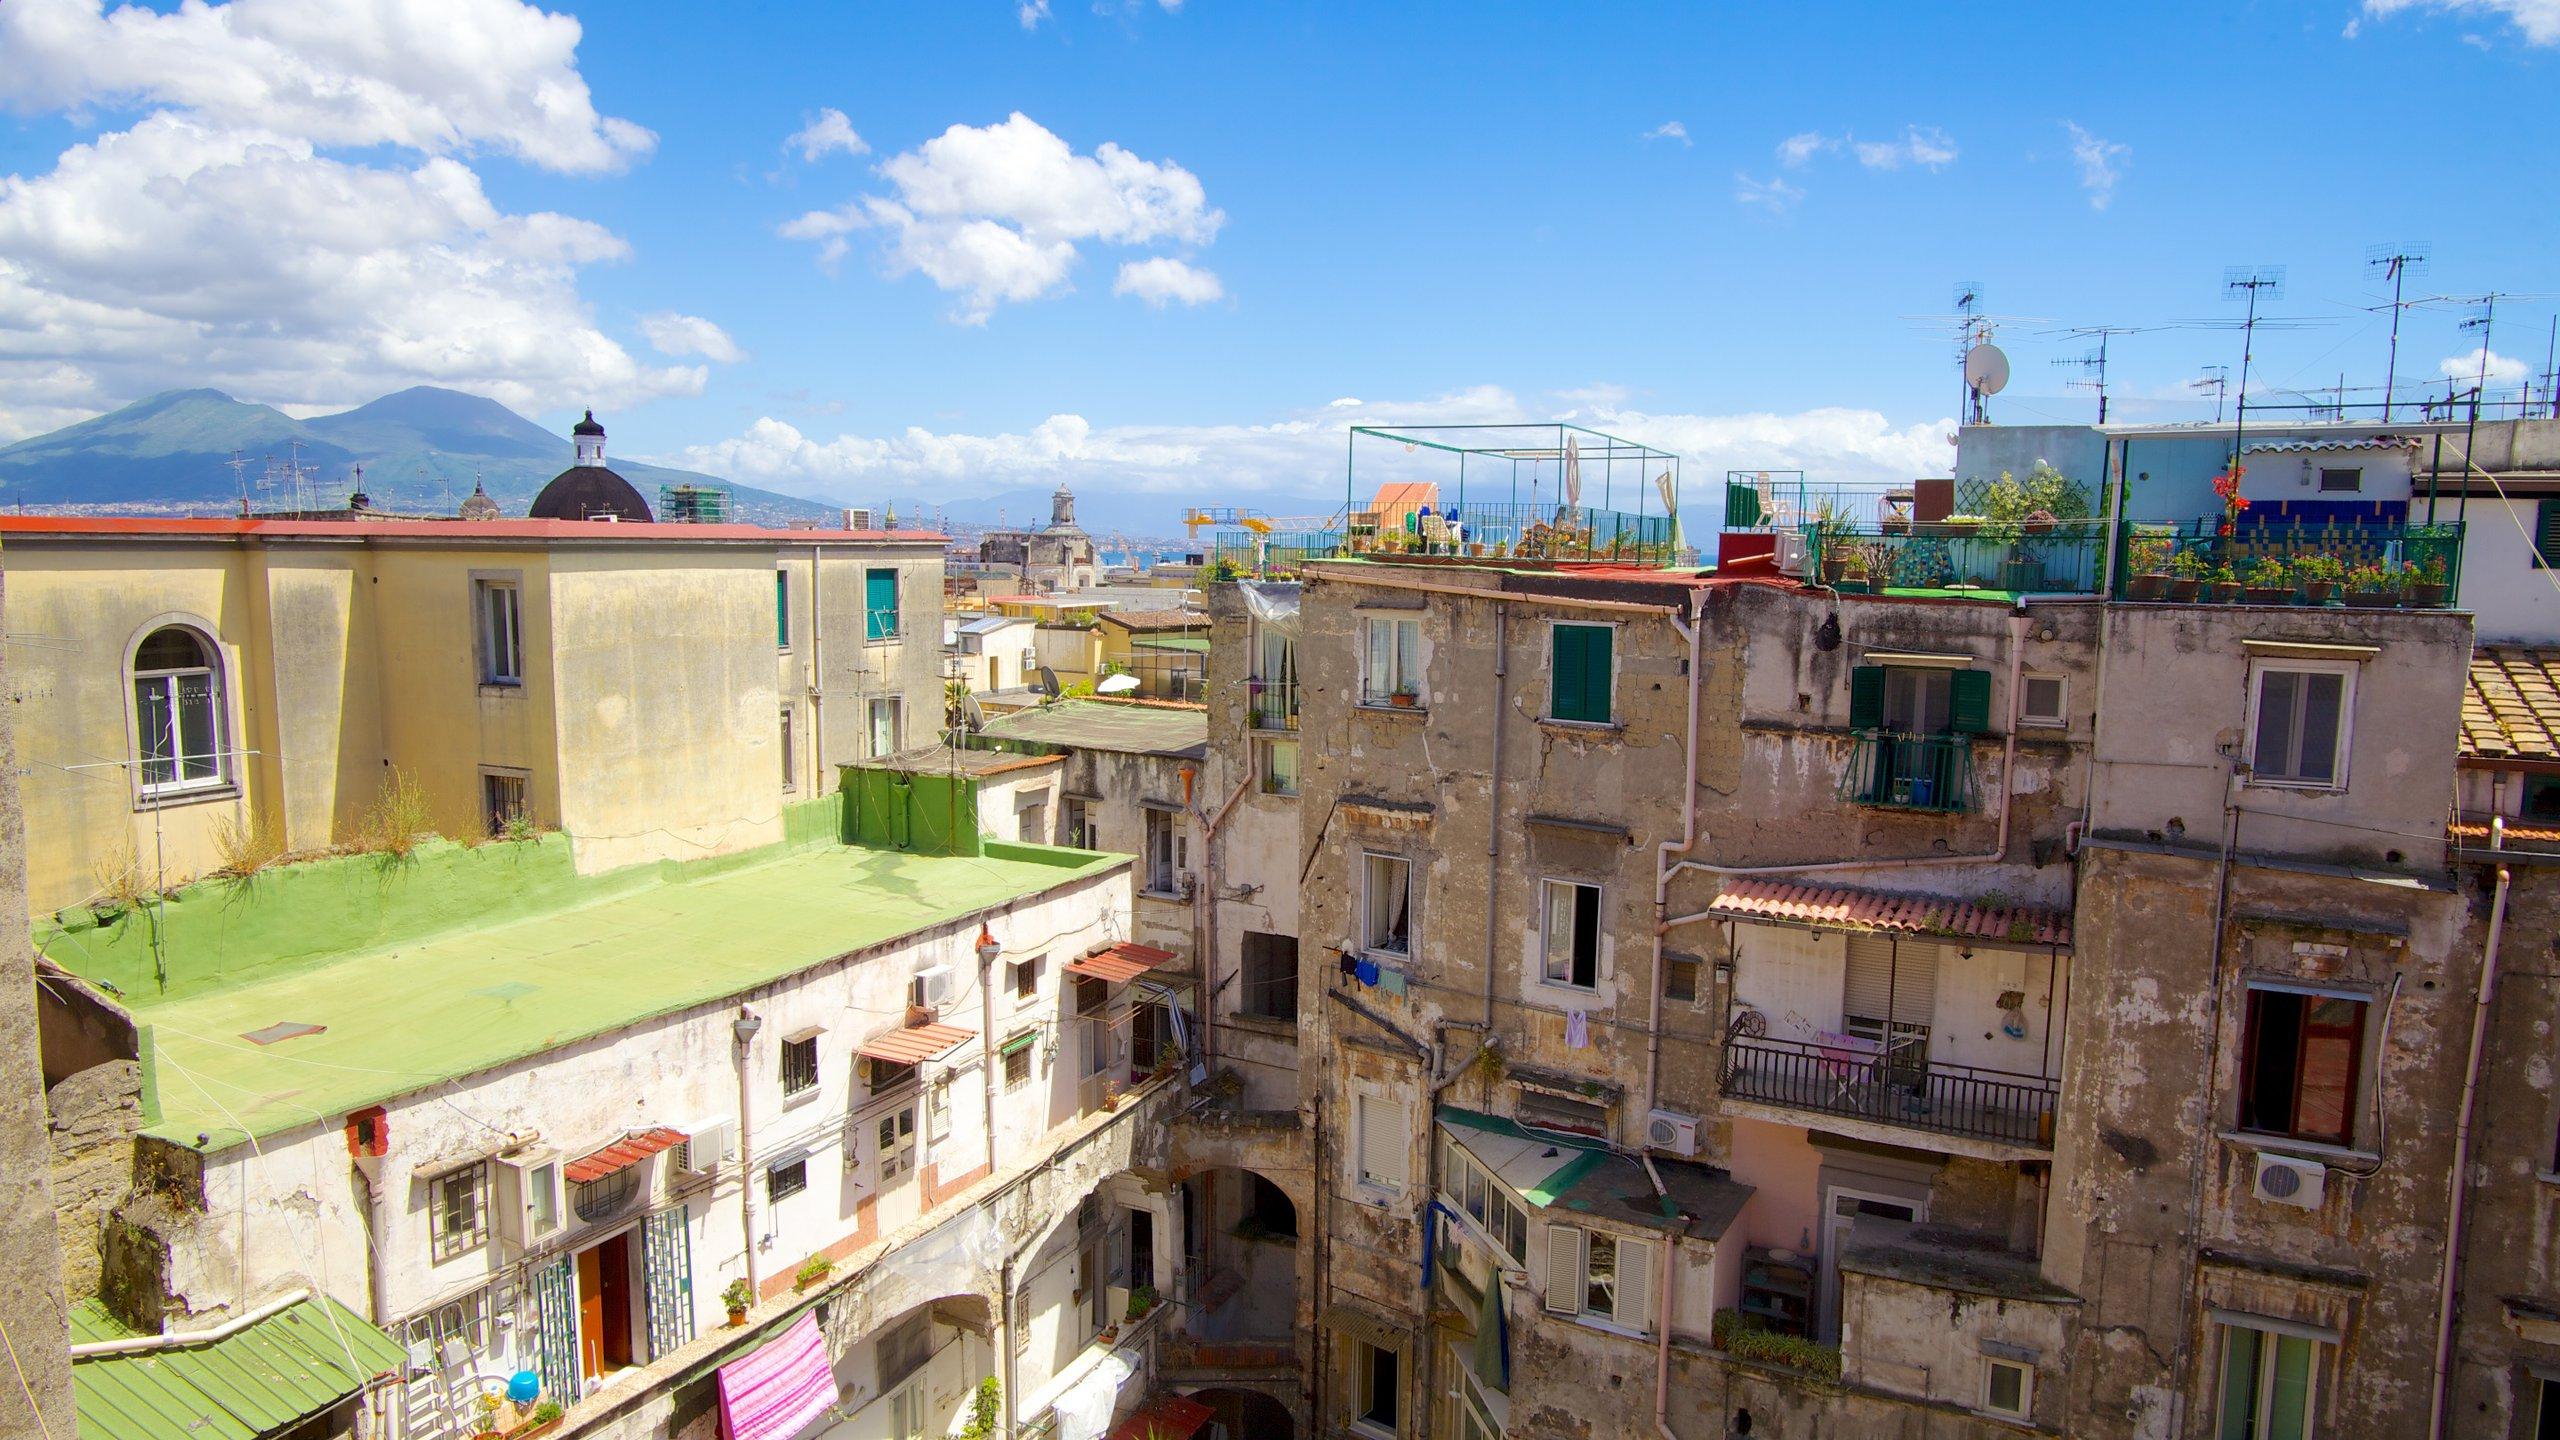 Naples City Centre, Naples, Campania, Italy